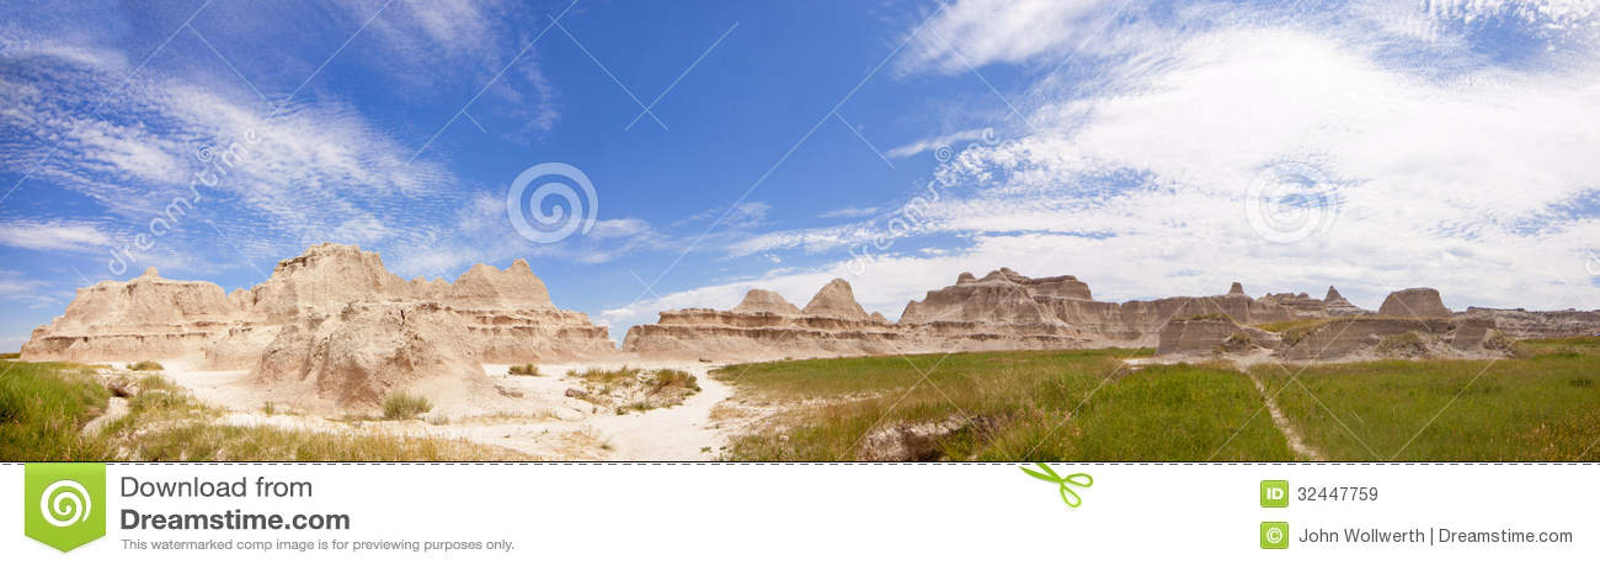 Badlandspanorama